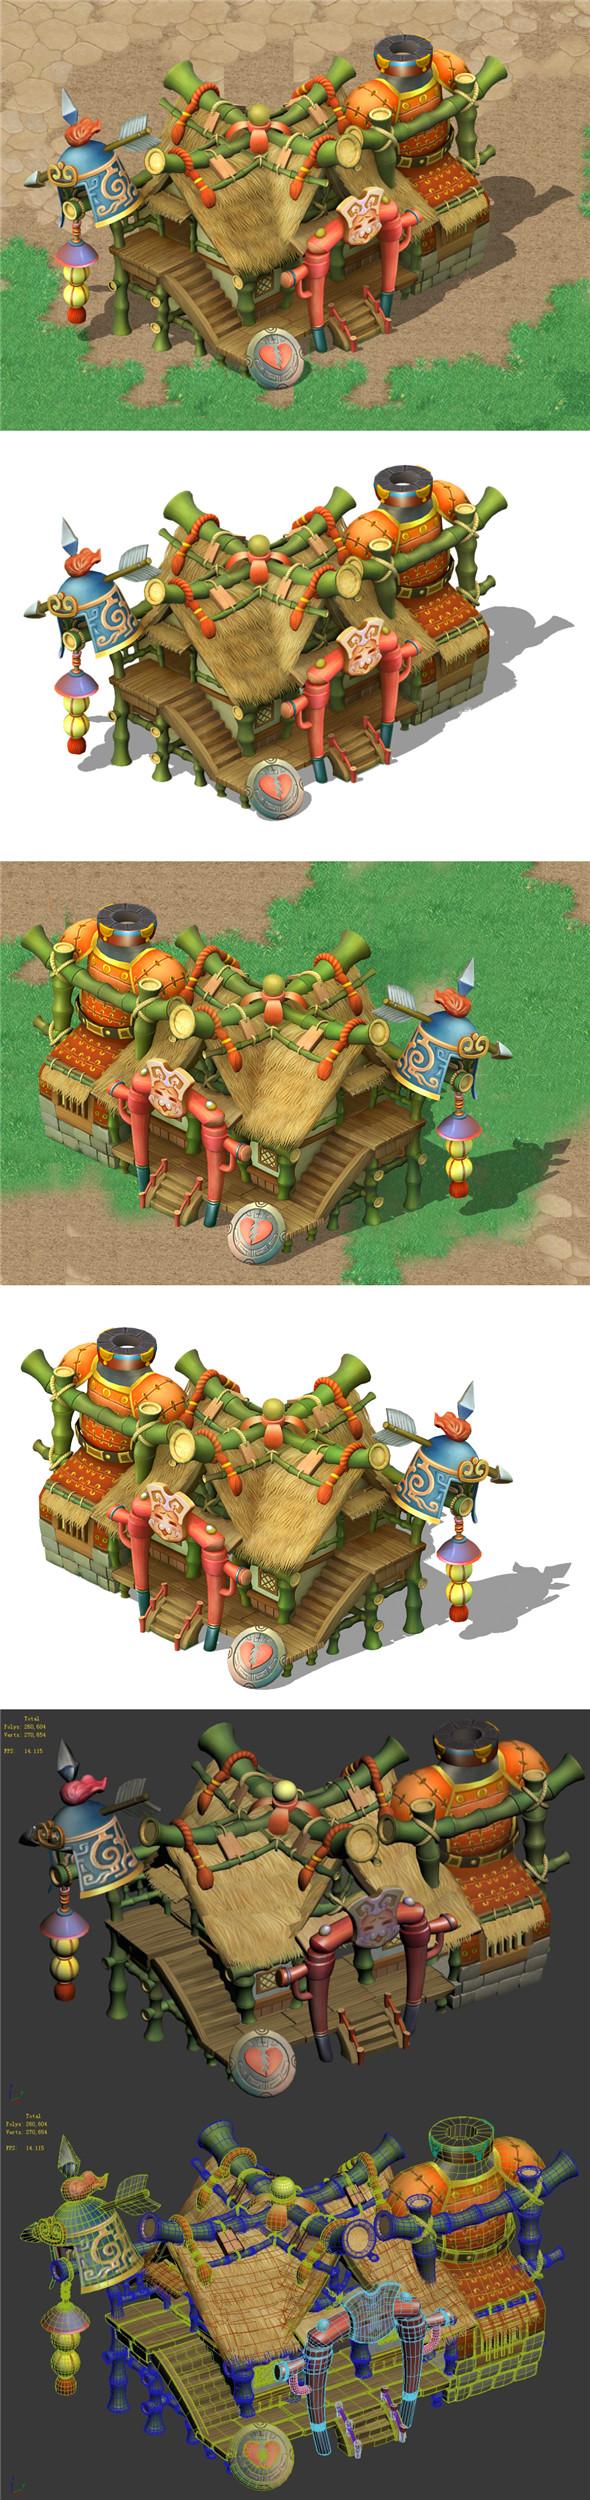 Cartoon world - armor shop - 3DOcean Item for Sale